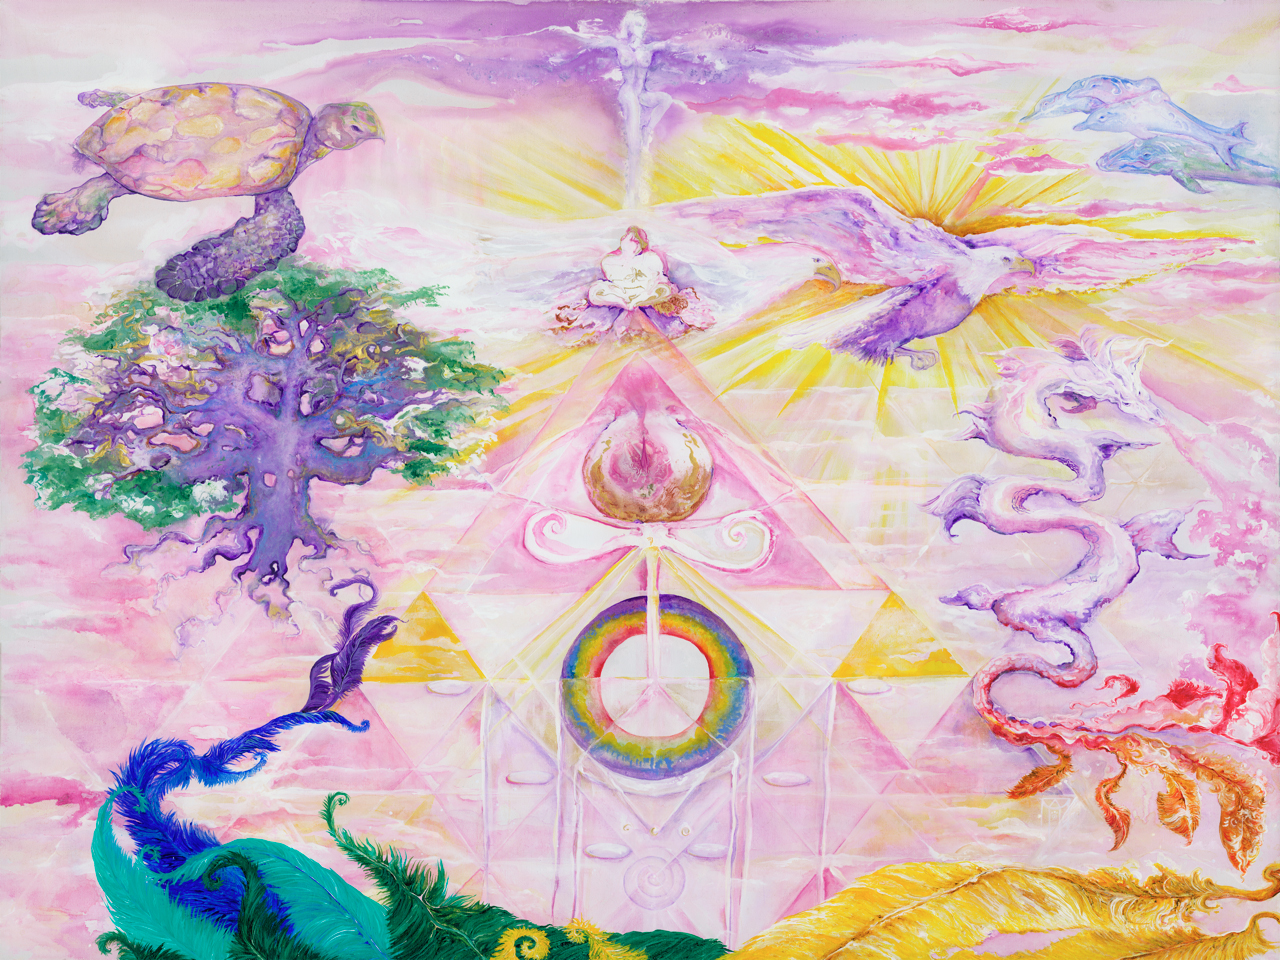 Lemurian Dream